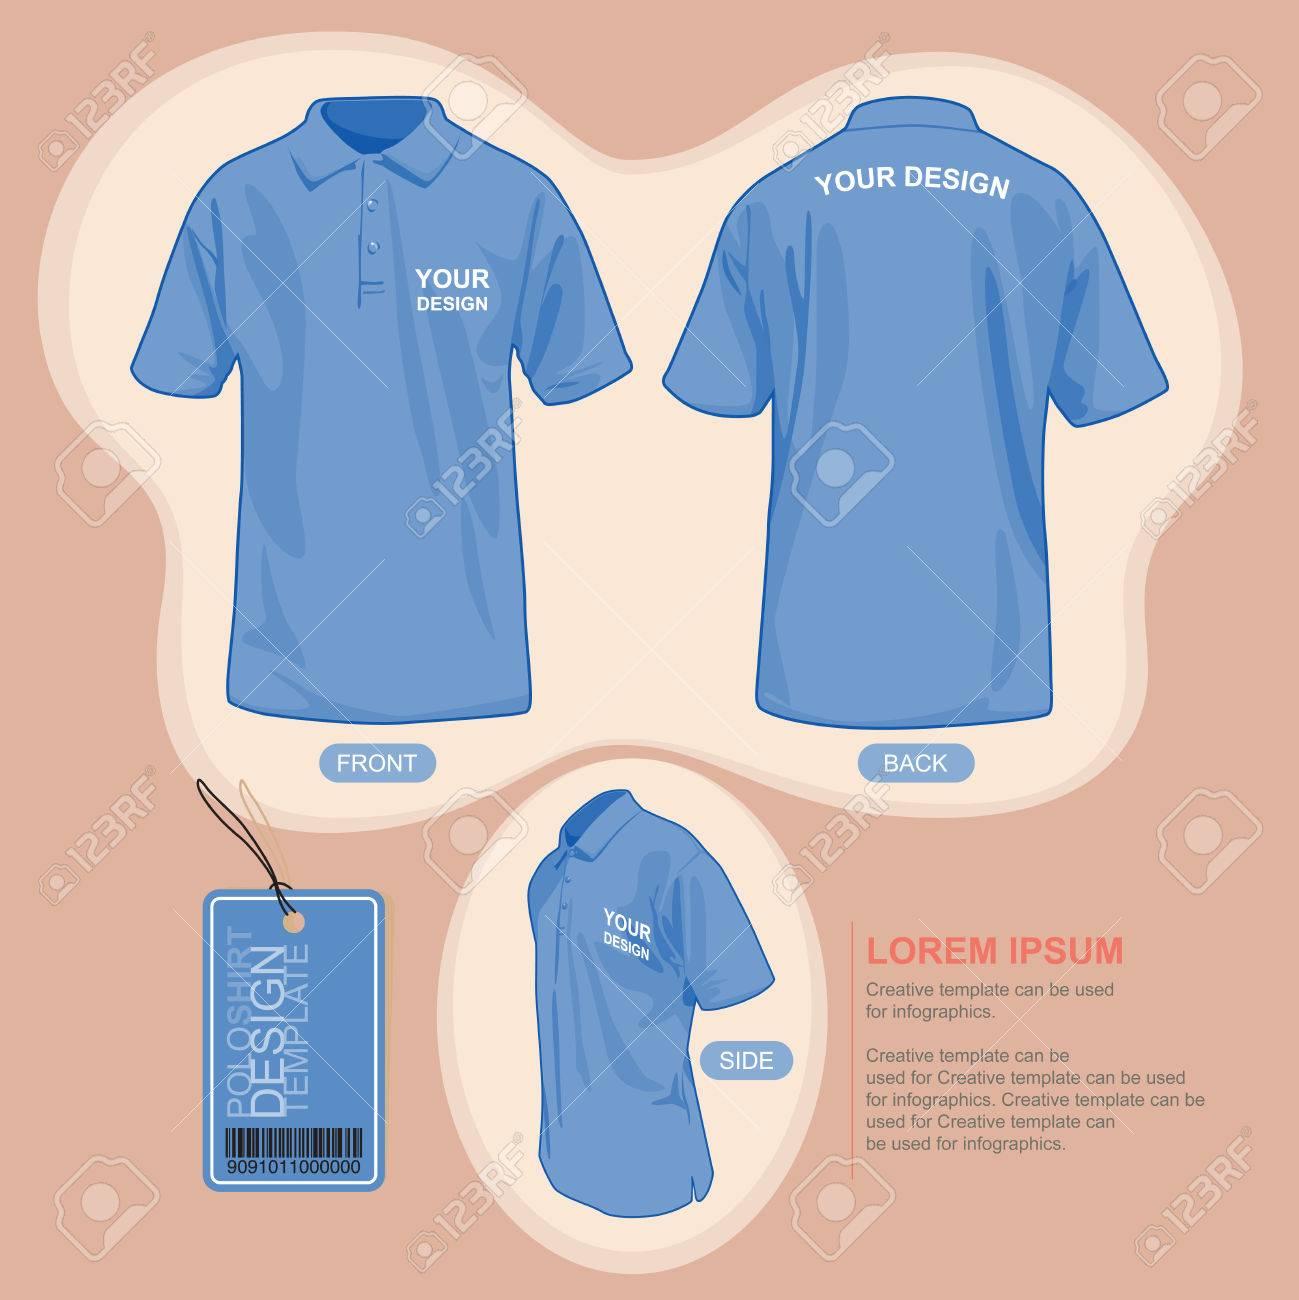 Shirt uniform design vector - Polo Shirt Uniform Template Illustration By Vector Design Stock Vector 49475772